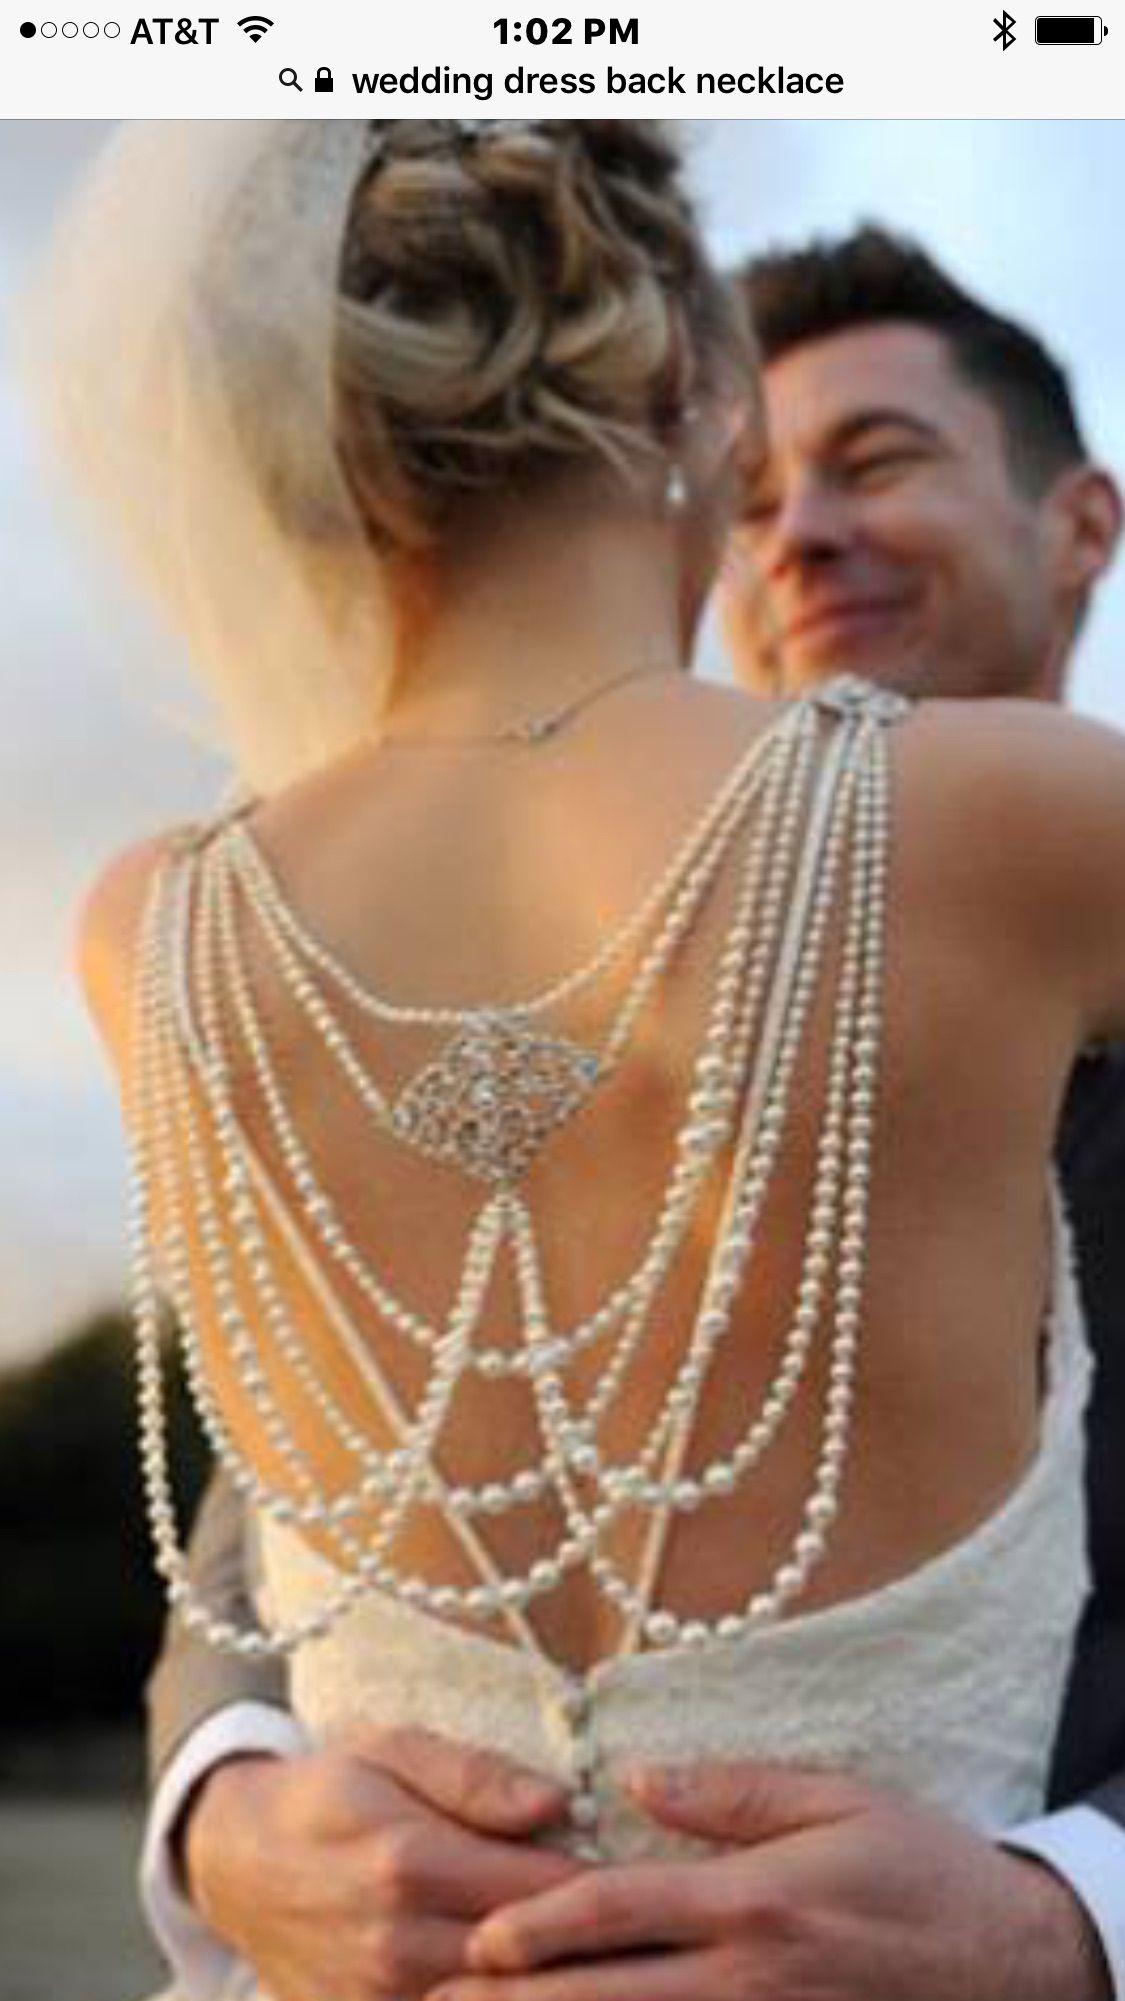 Pin by laura tester on my wedding pinterest bridal wedding